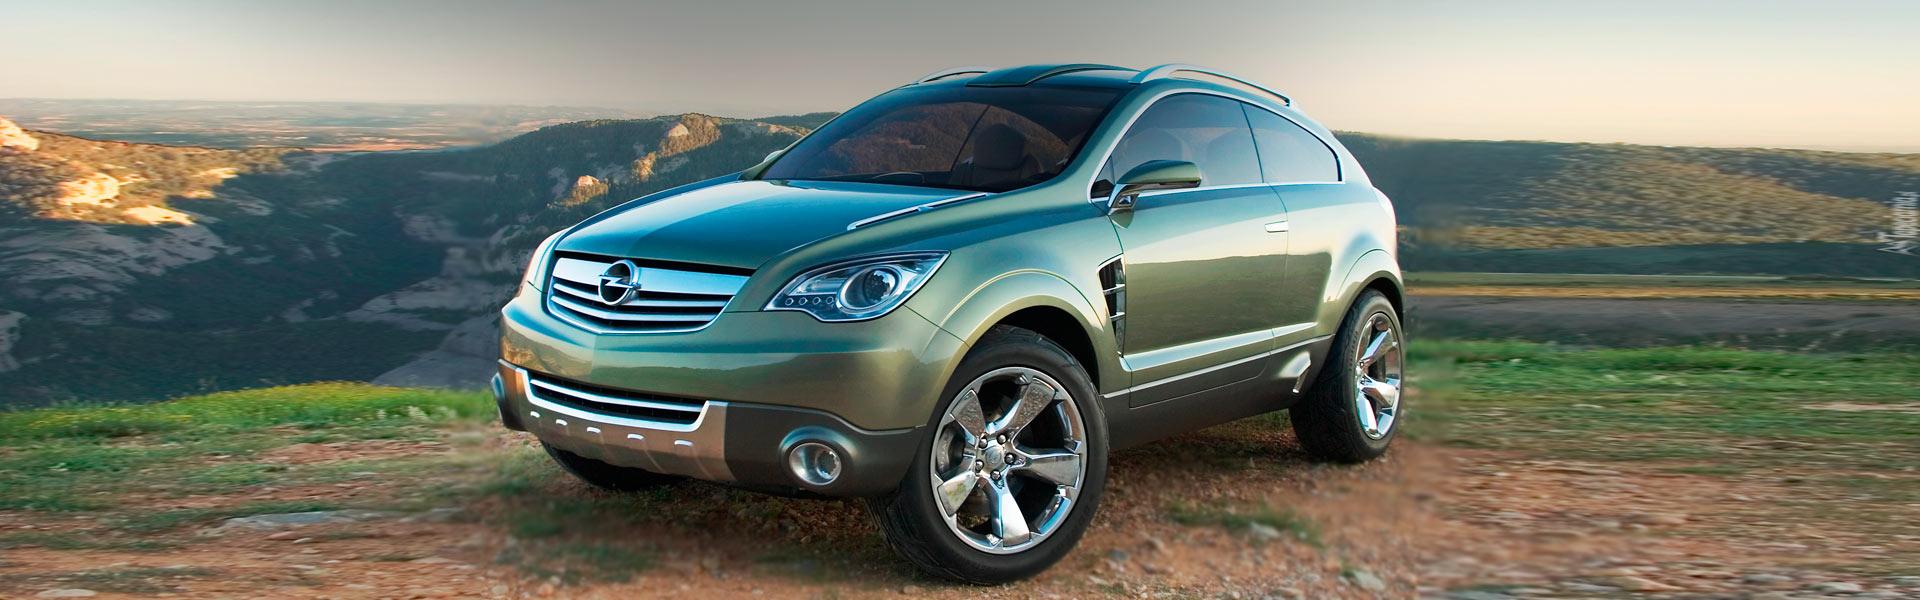 Запчасти на Opel Antara